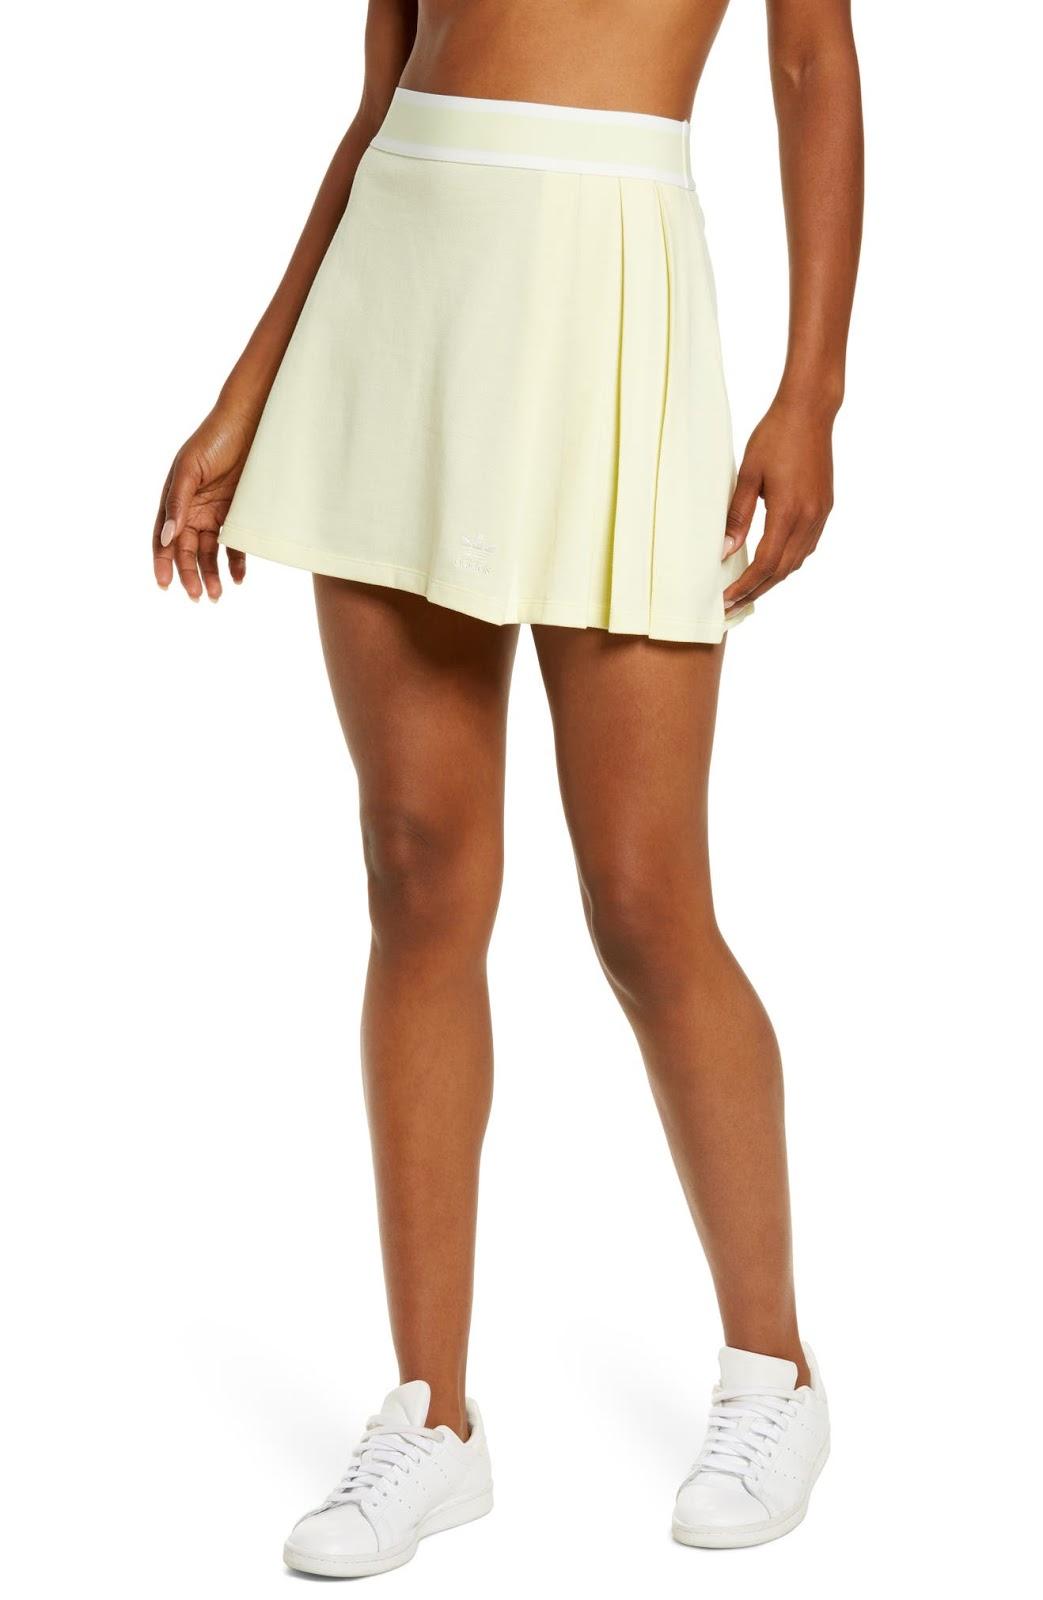 ADIDAS ORIGINALS Tennis Skirt, Main, color, HAZY YELLOW